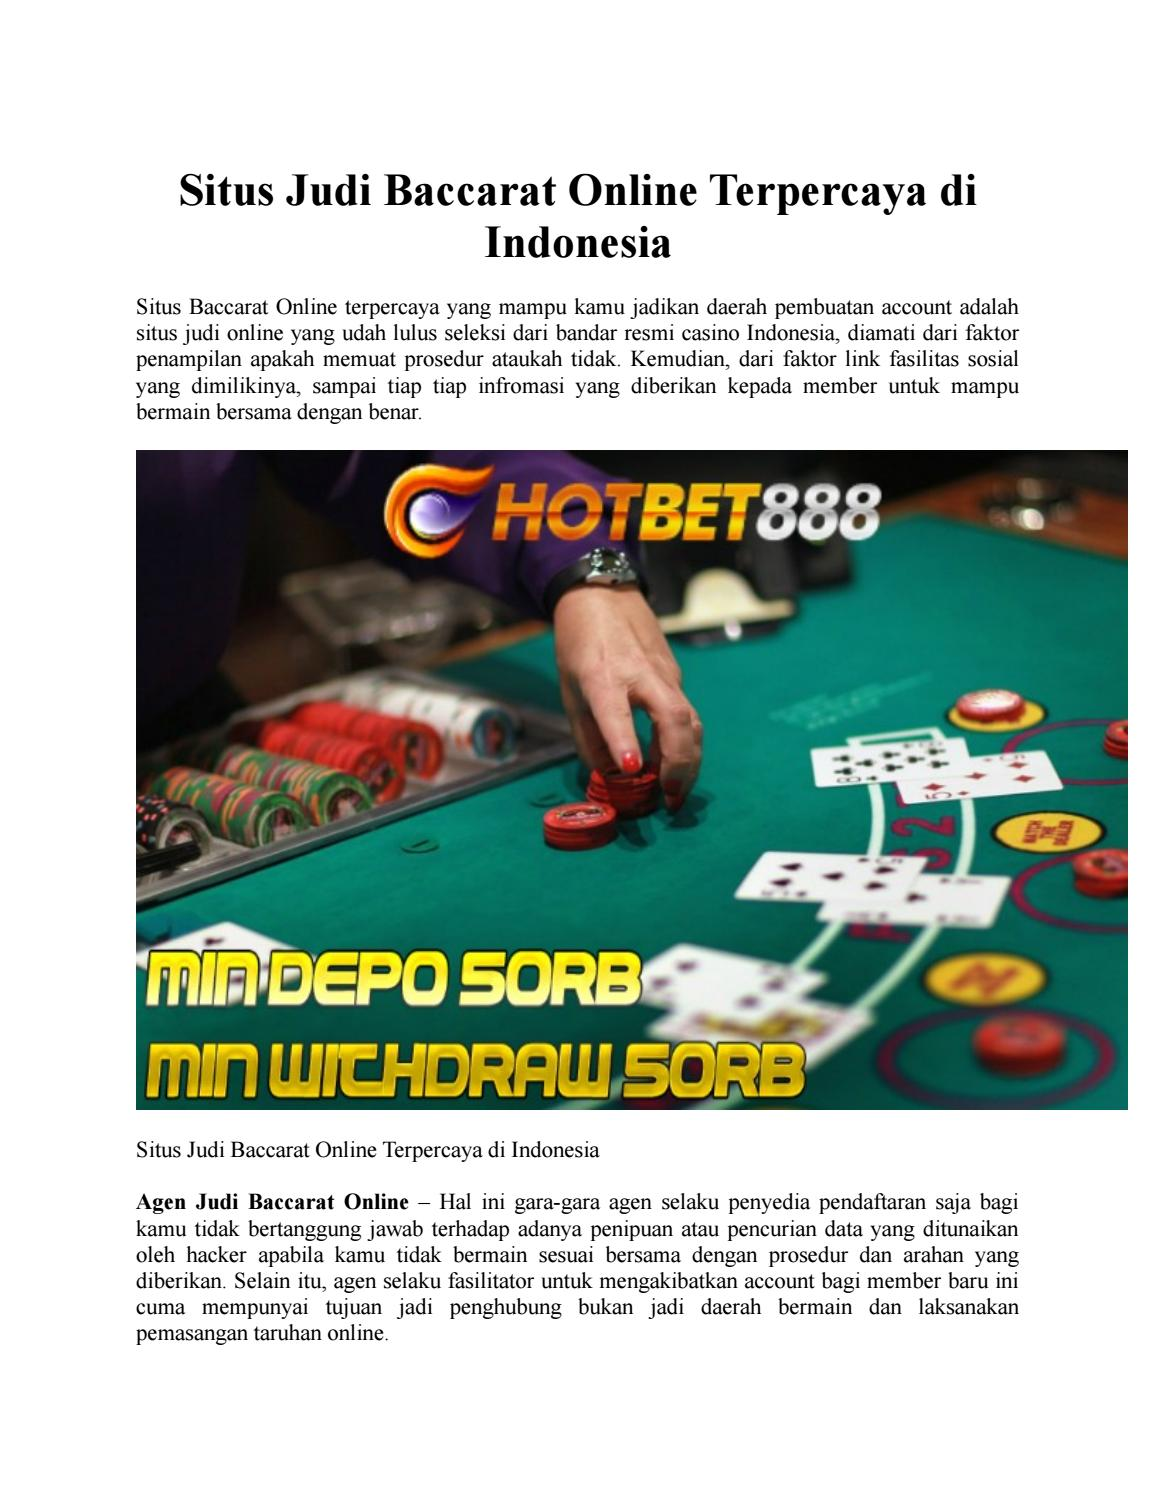 Situs Judi Baccarat Online Terpercaya Di Indonesia By Adeline Syifa Issuu